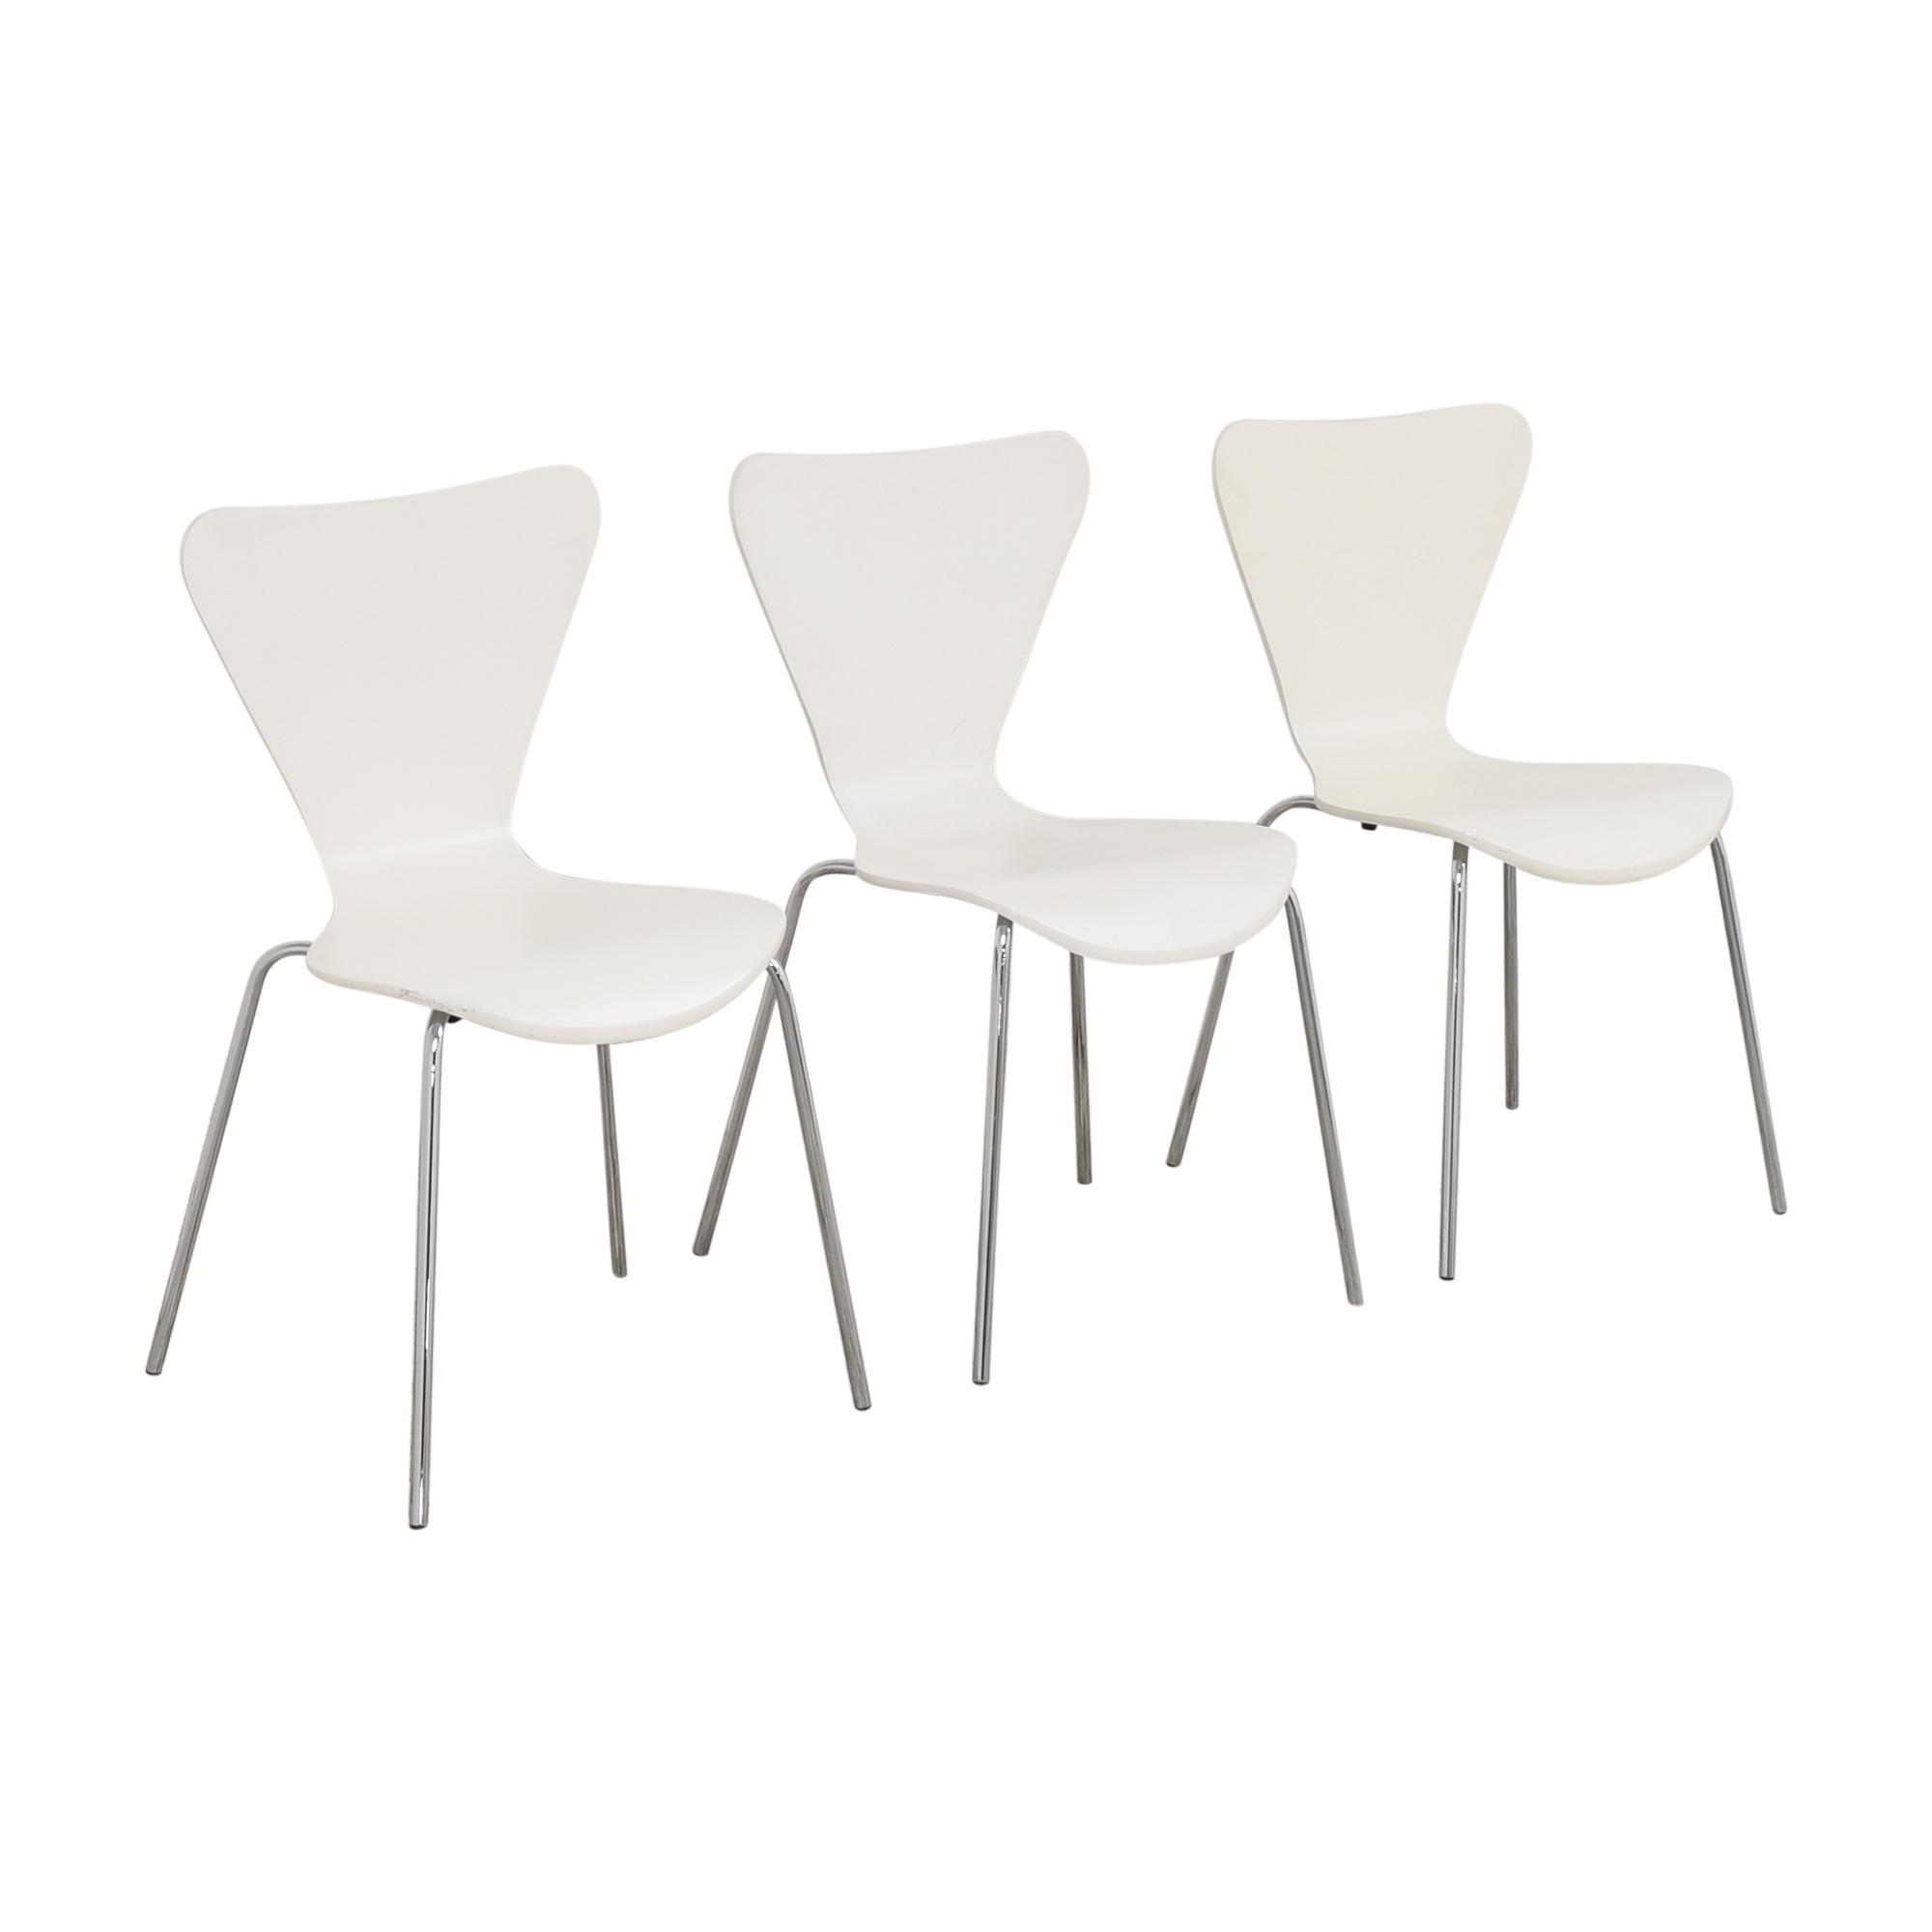 shop Room & Board Jake Dining Chairs Room & Board